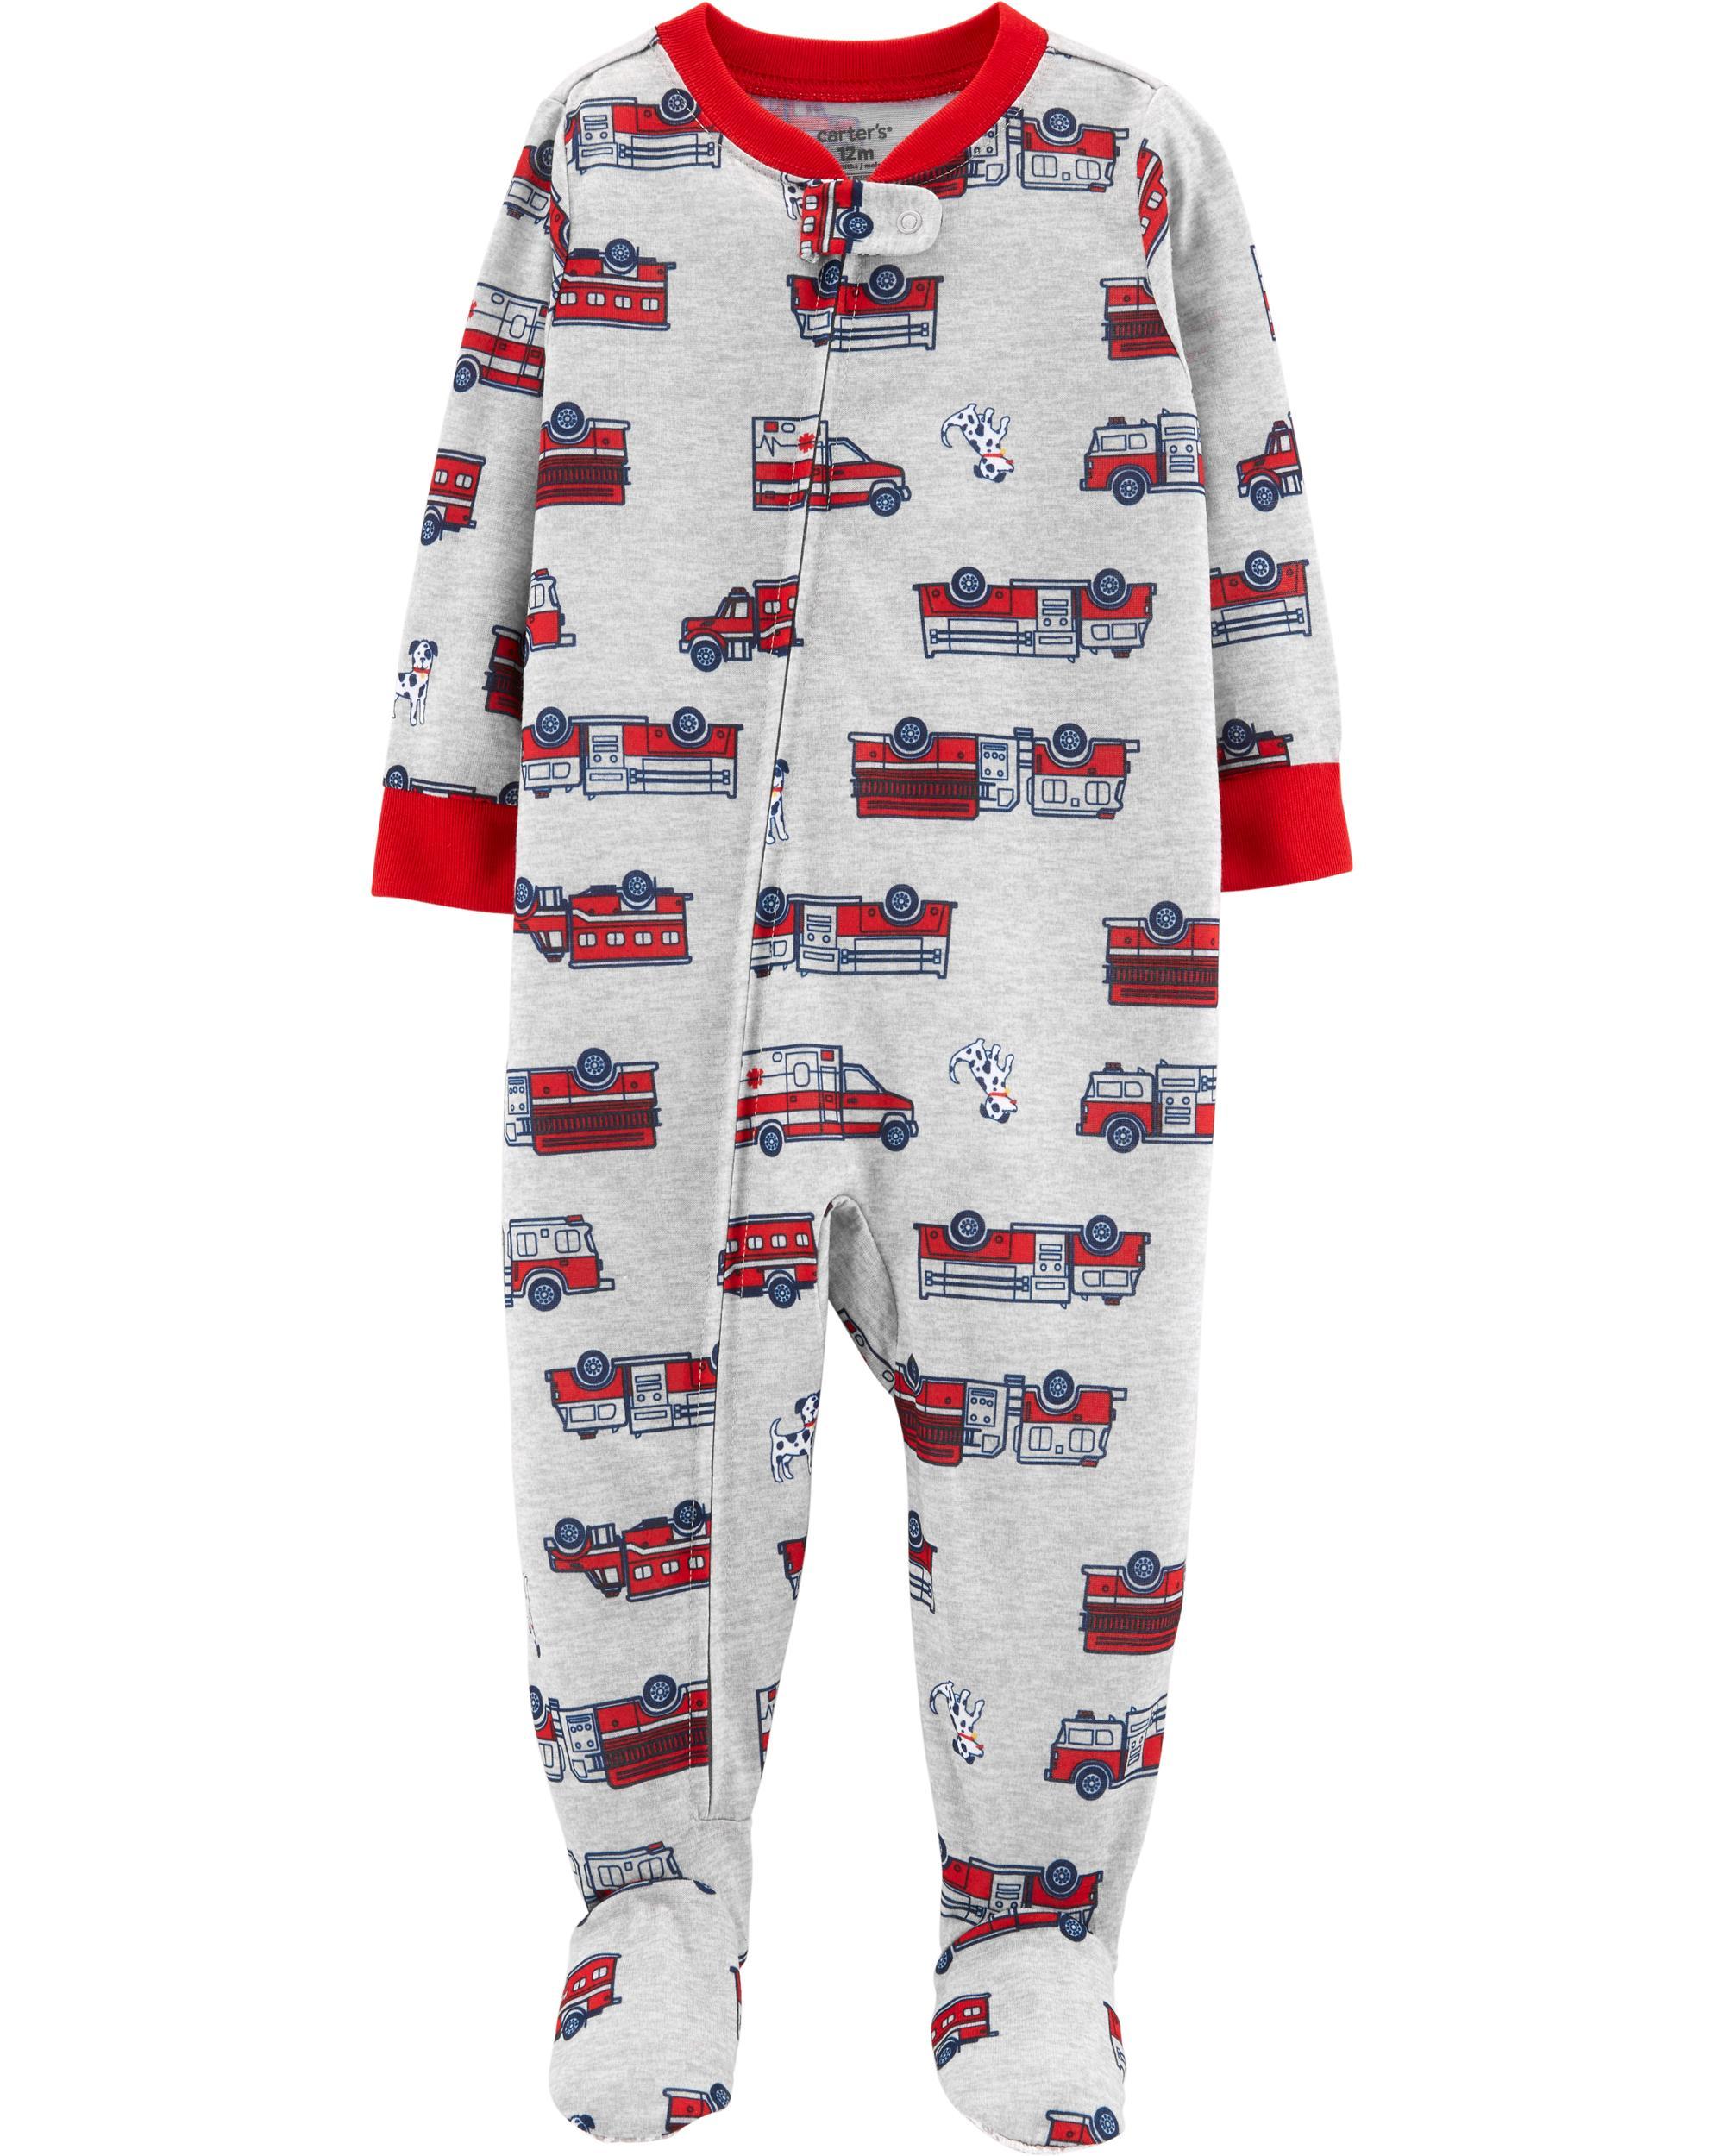 Carters Boys Toddler 1 Piece Poly Sleepwear